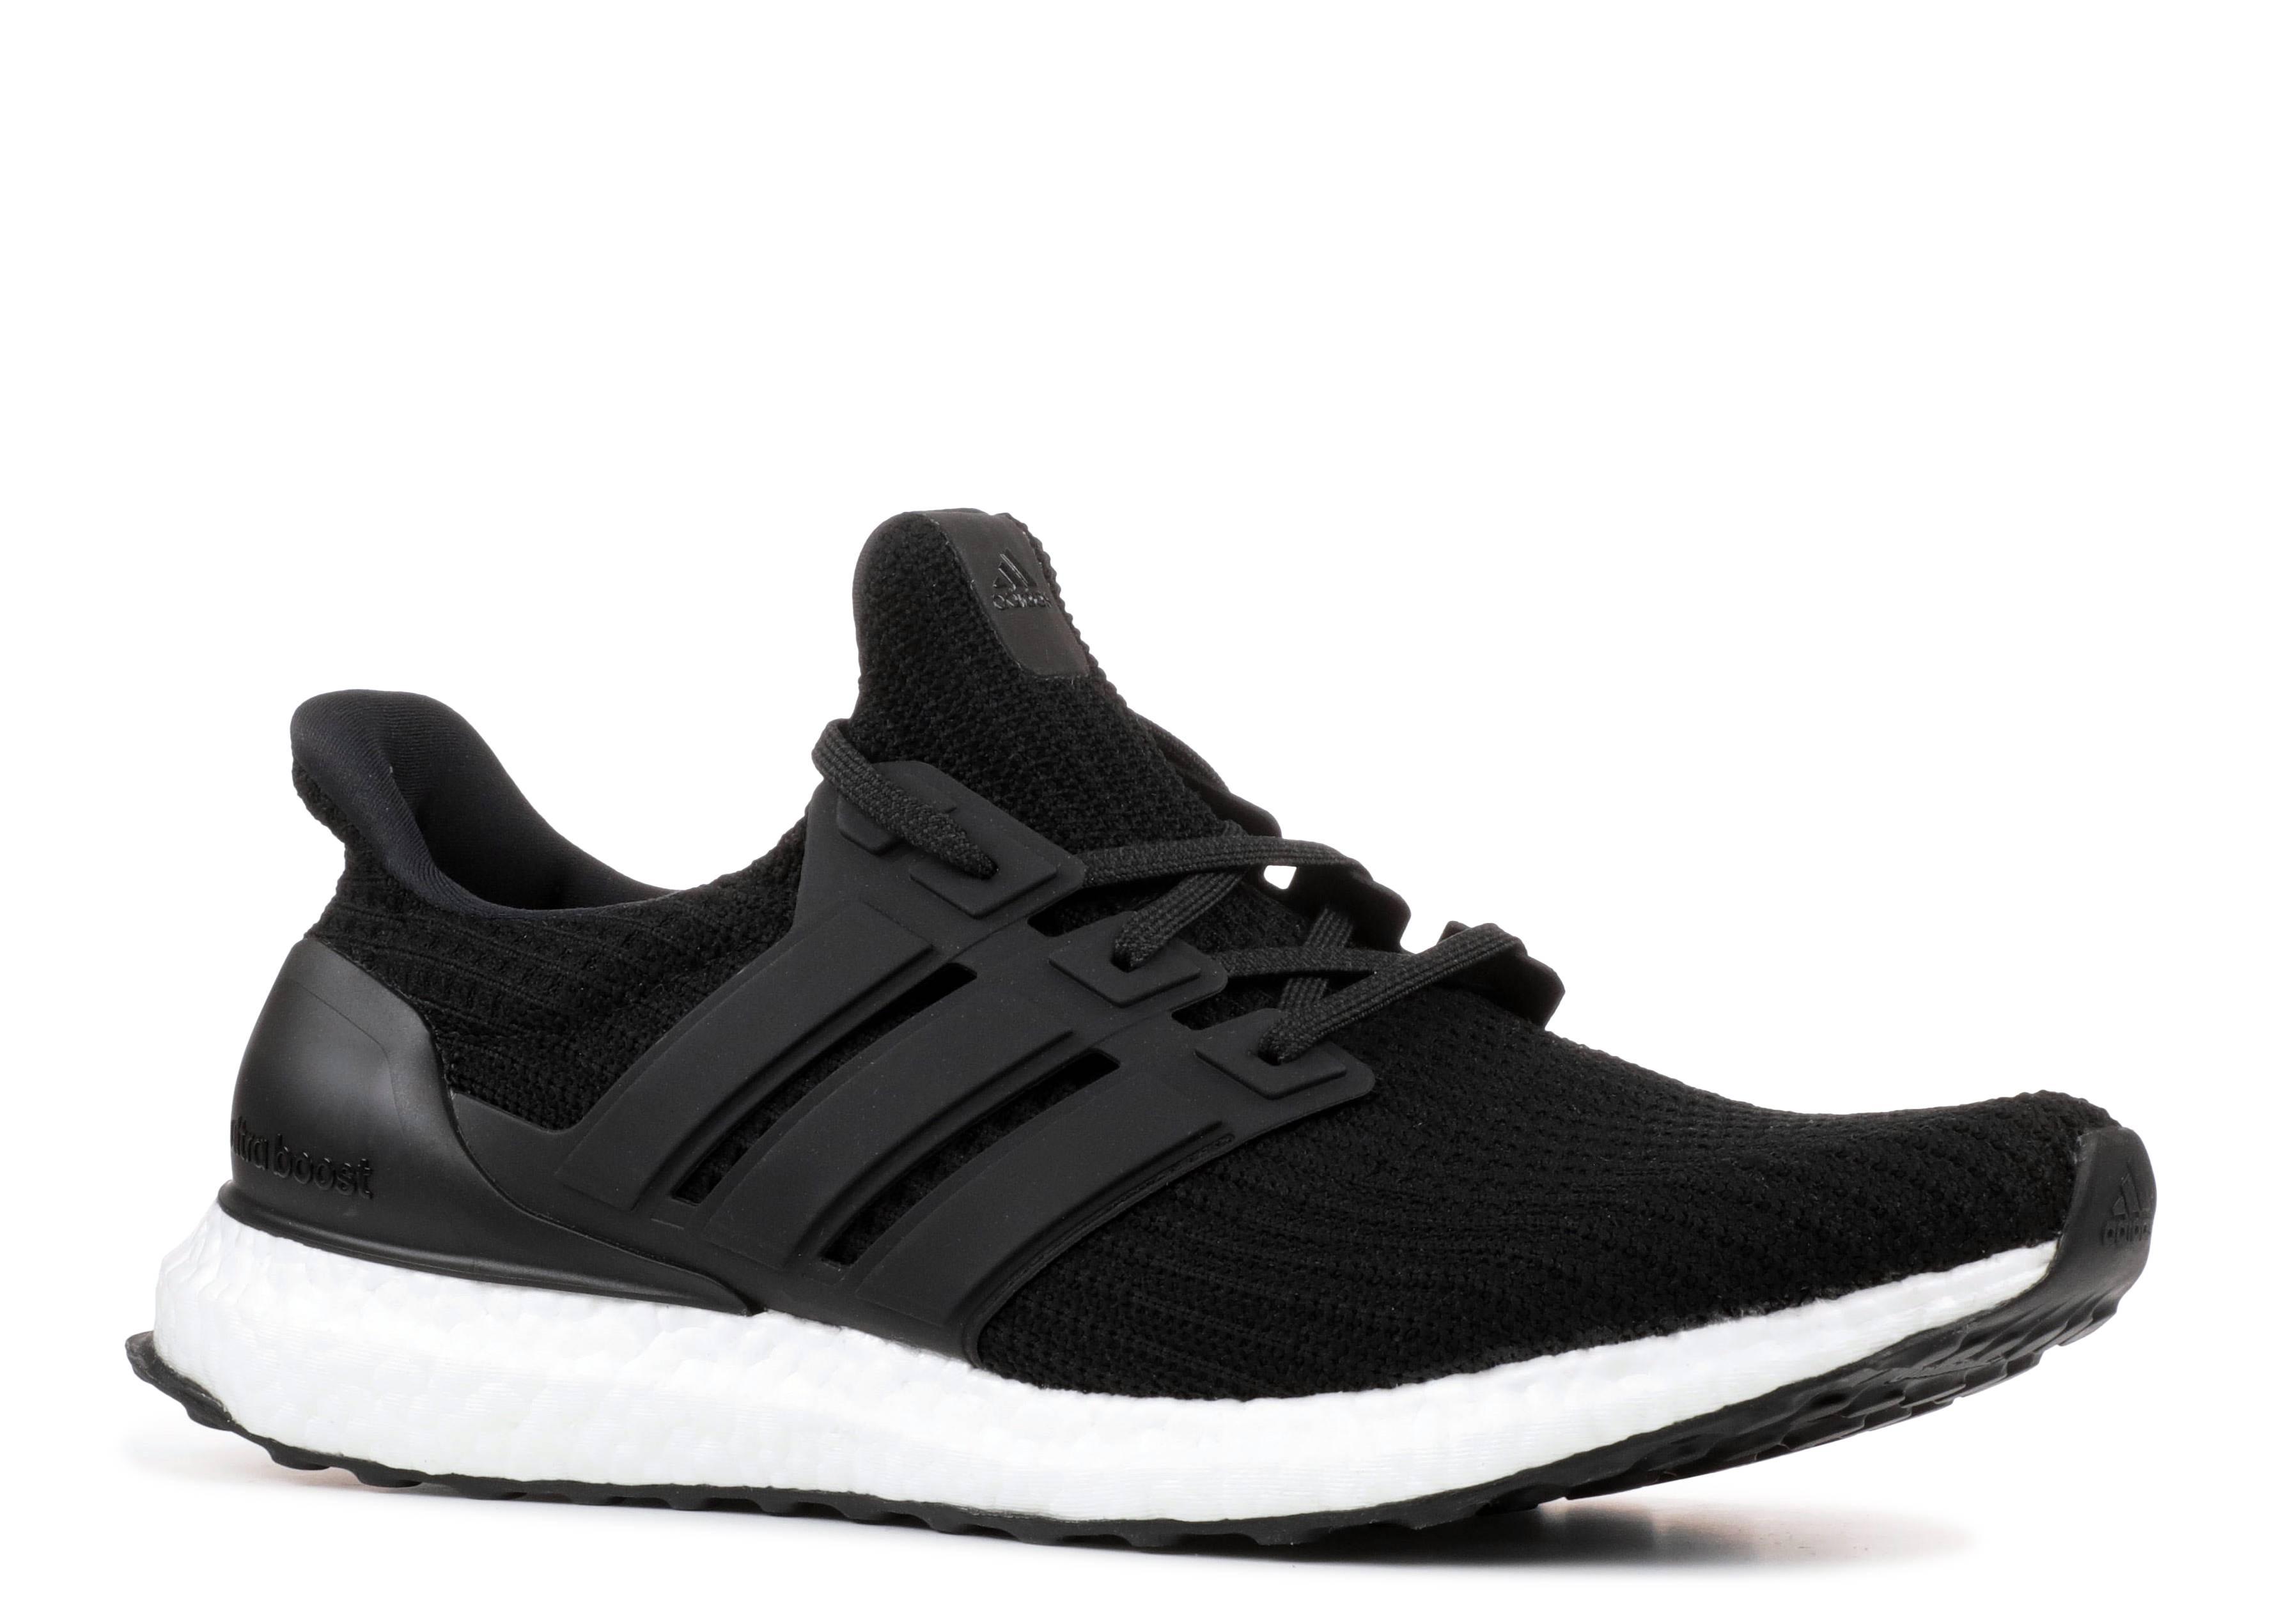 89f3bf1c1 Adidas Ultra Boost 4.0 Core Black - 1